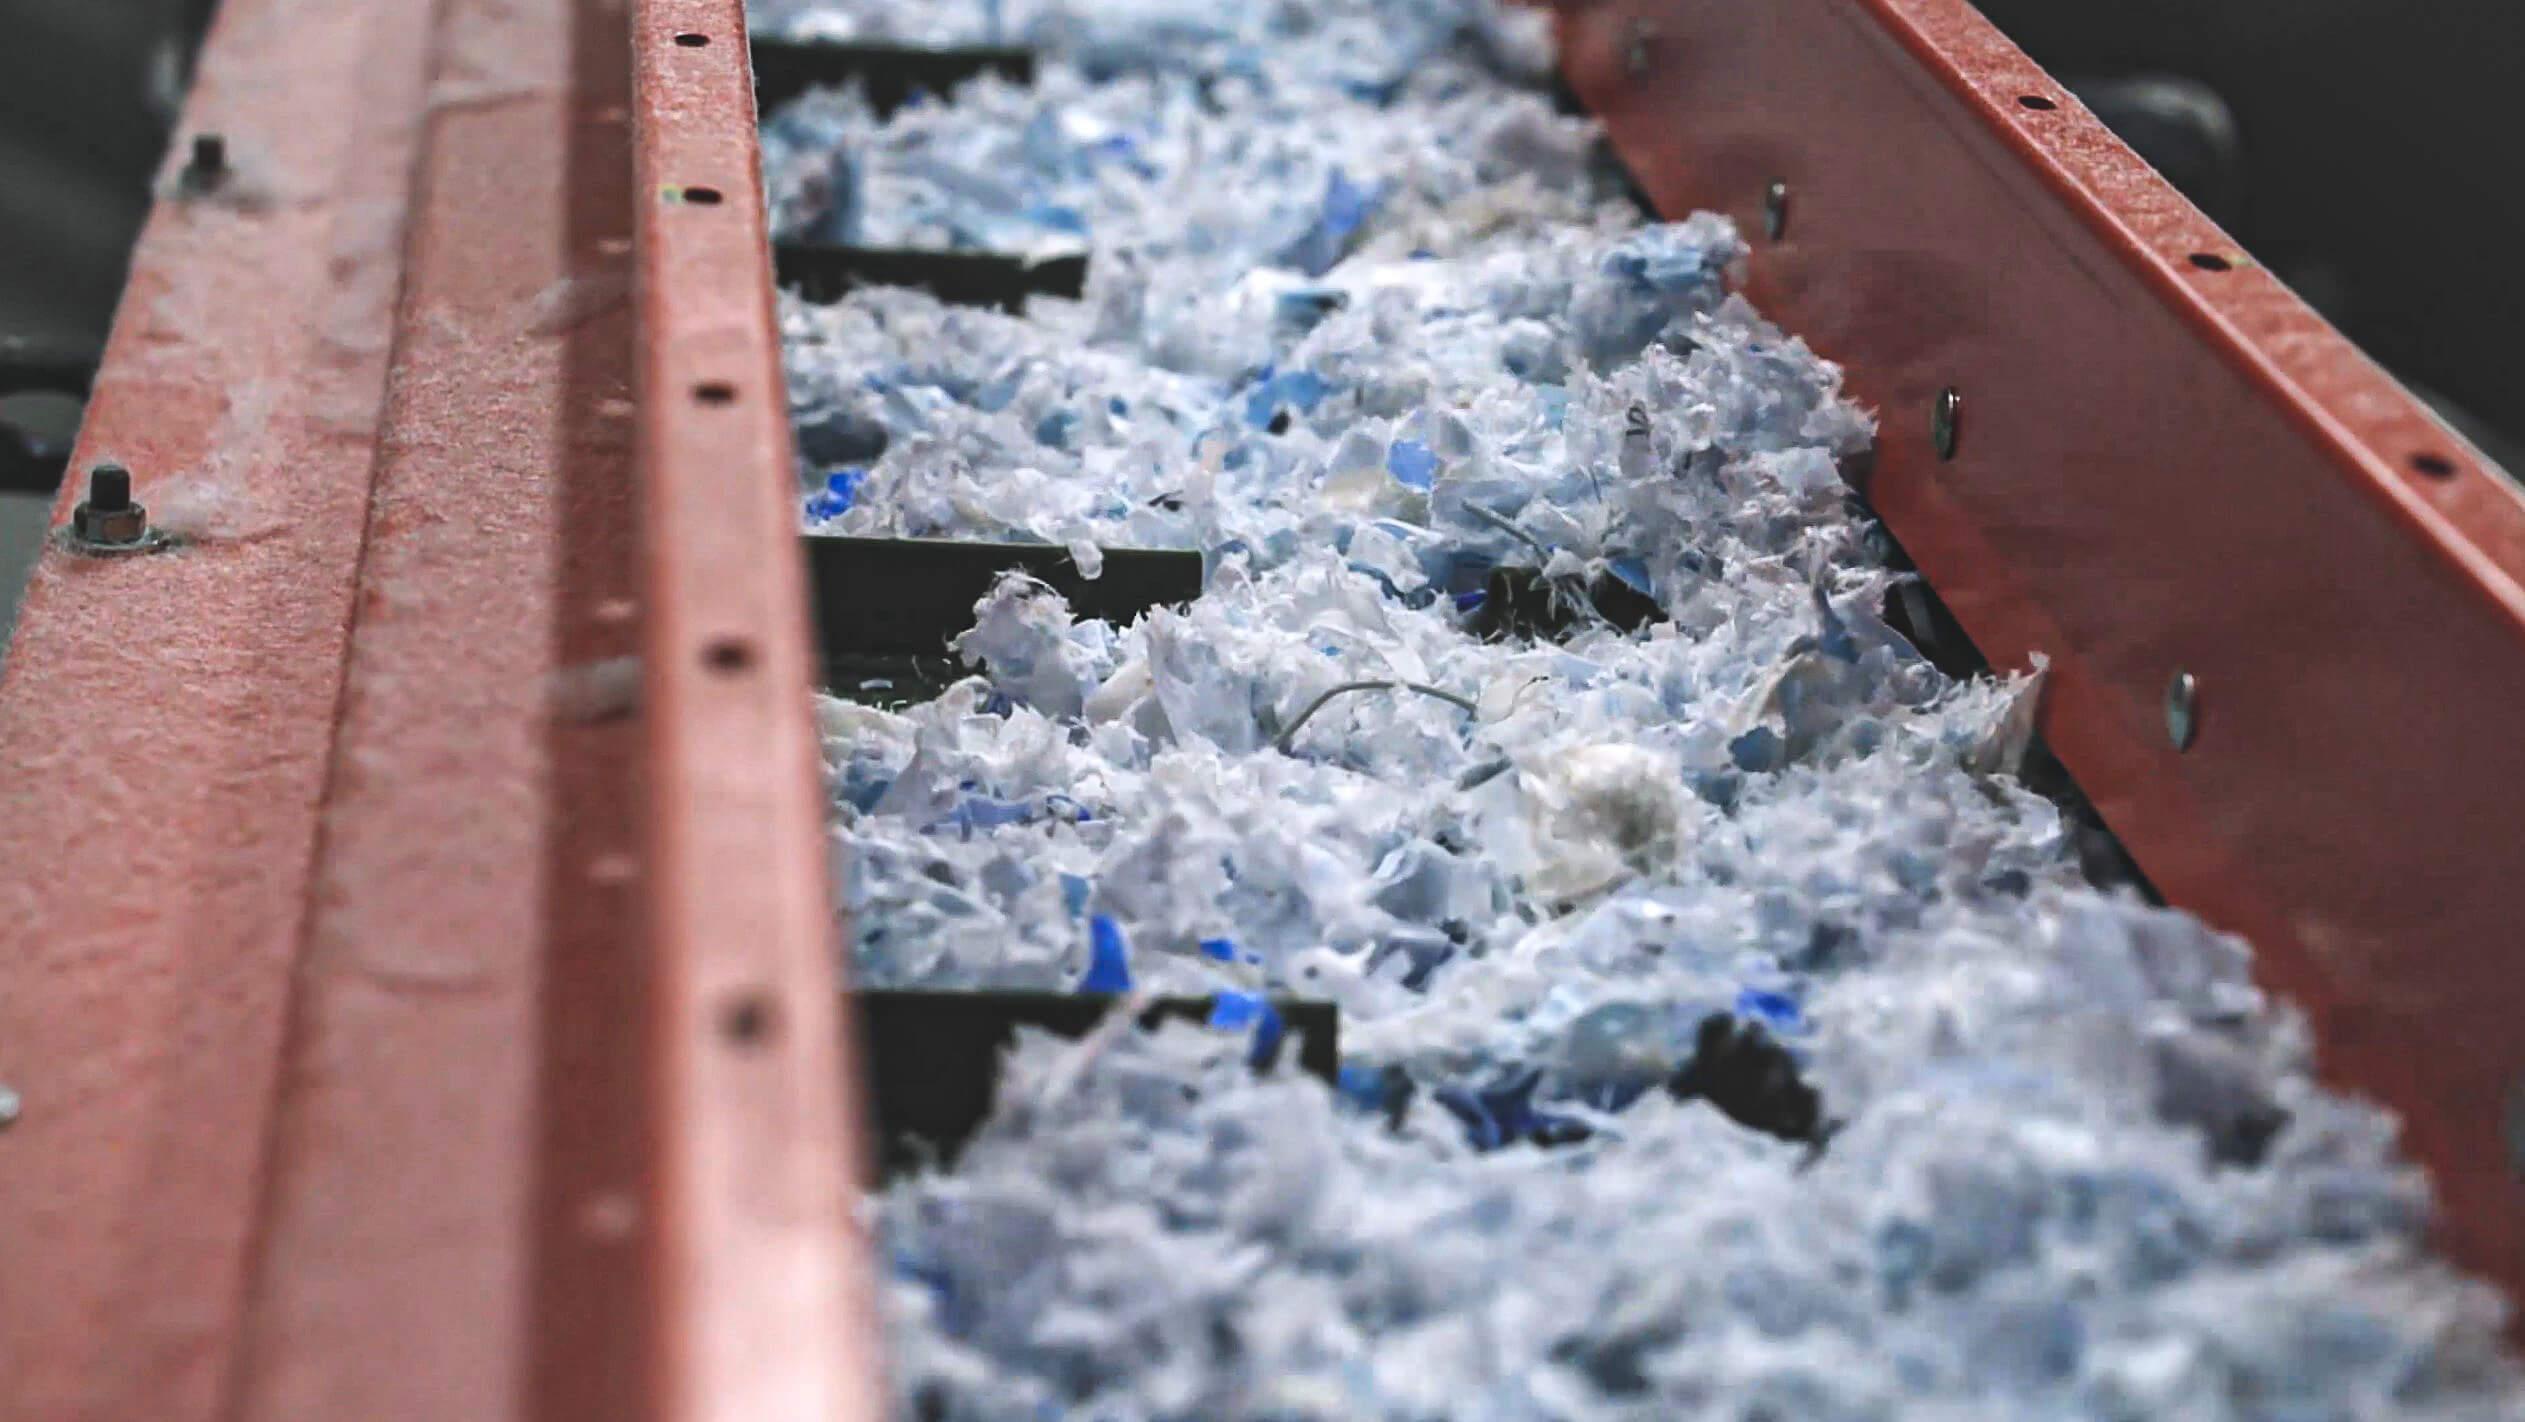 shredded plastic on conveyor belt